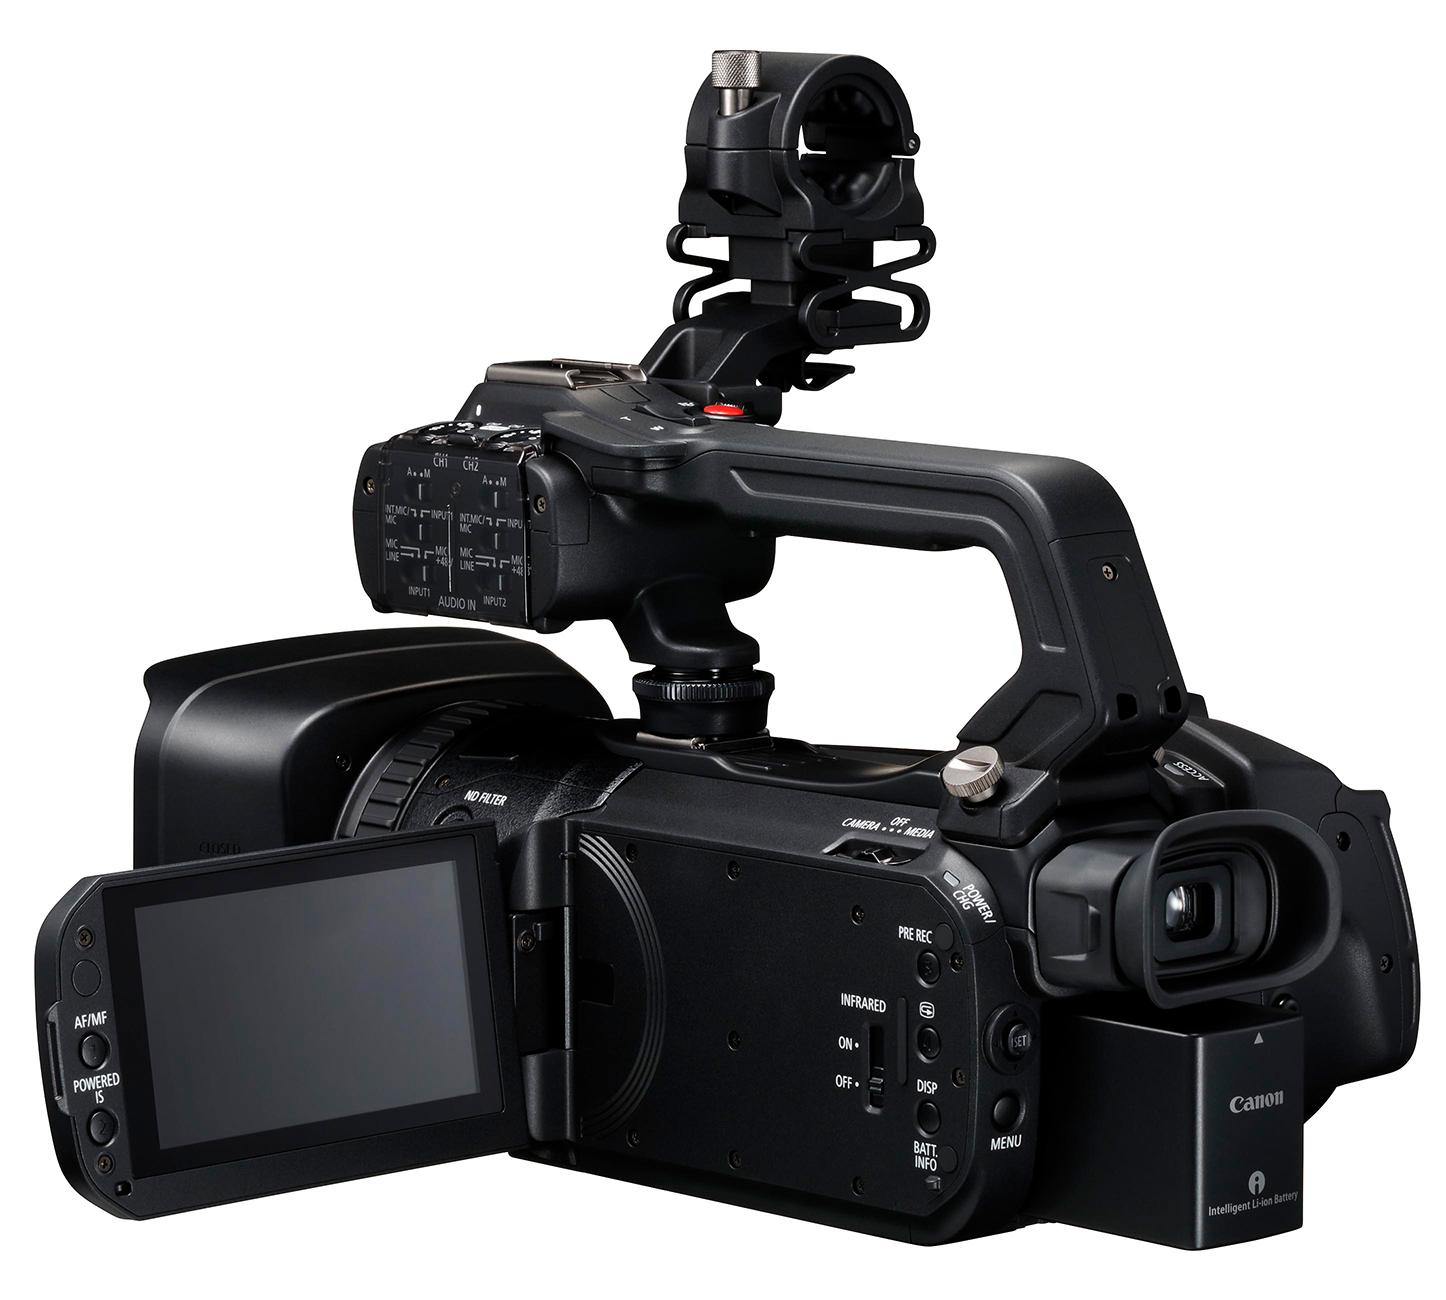 Test : Canon XF400, XF405 und GX10 4K-Camcorder: Formate / Interna